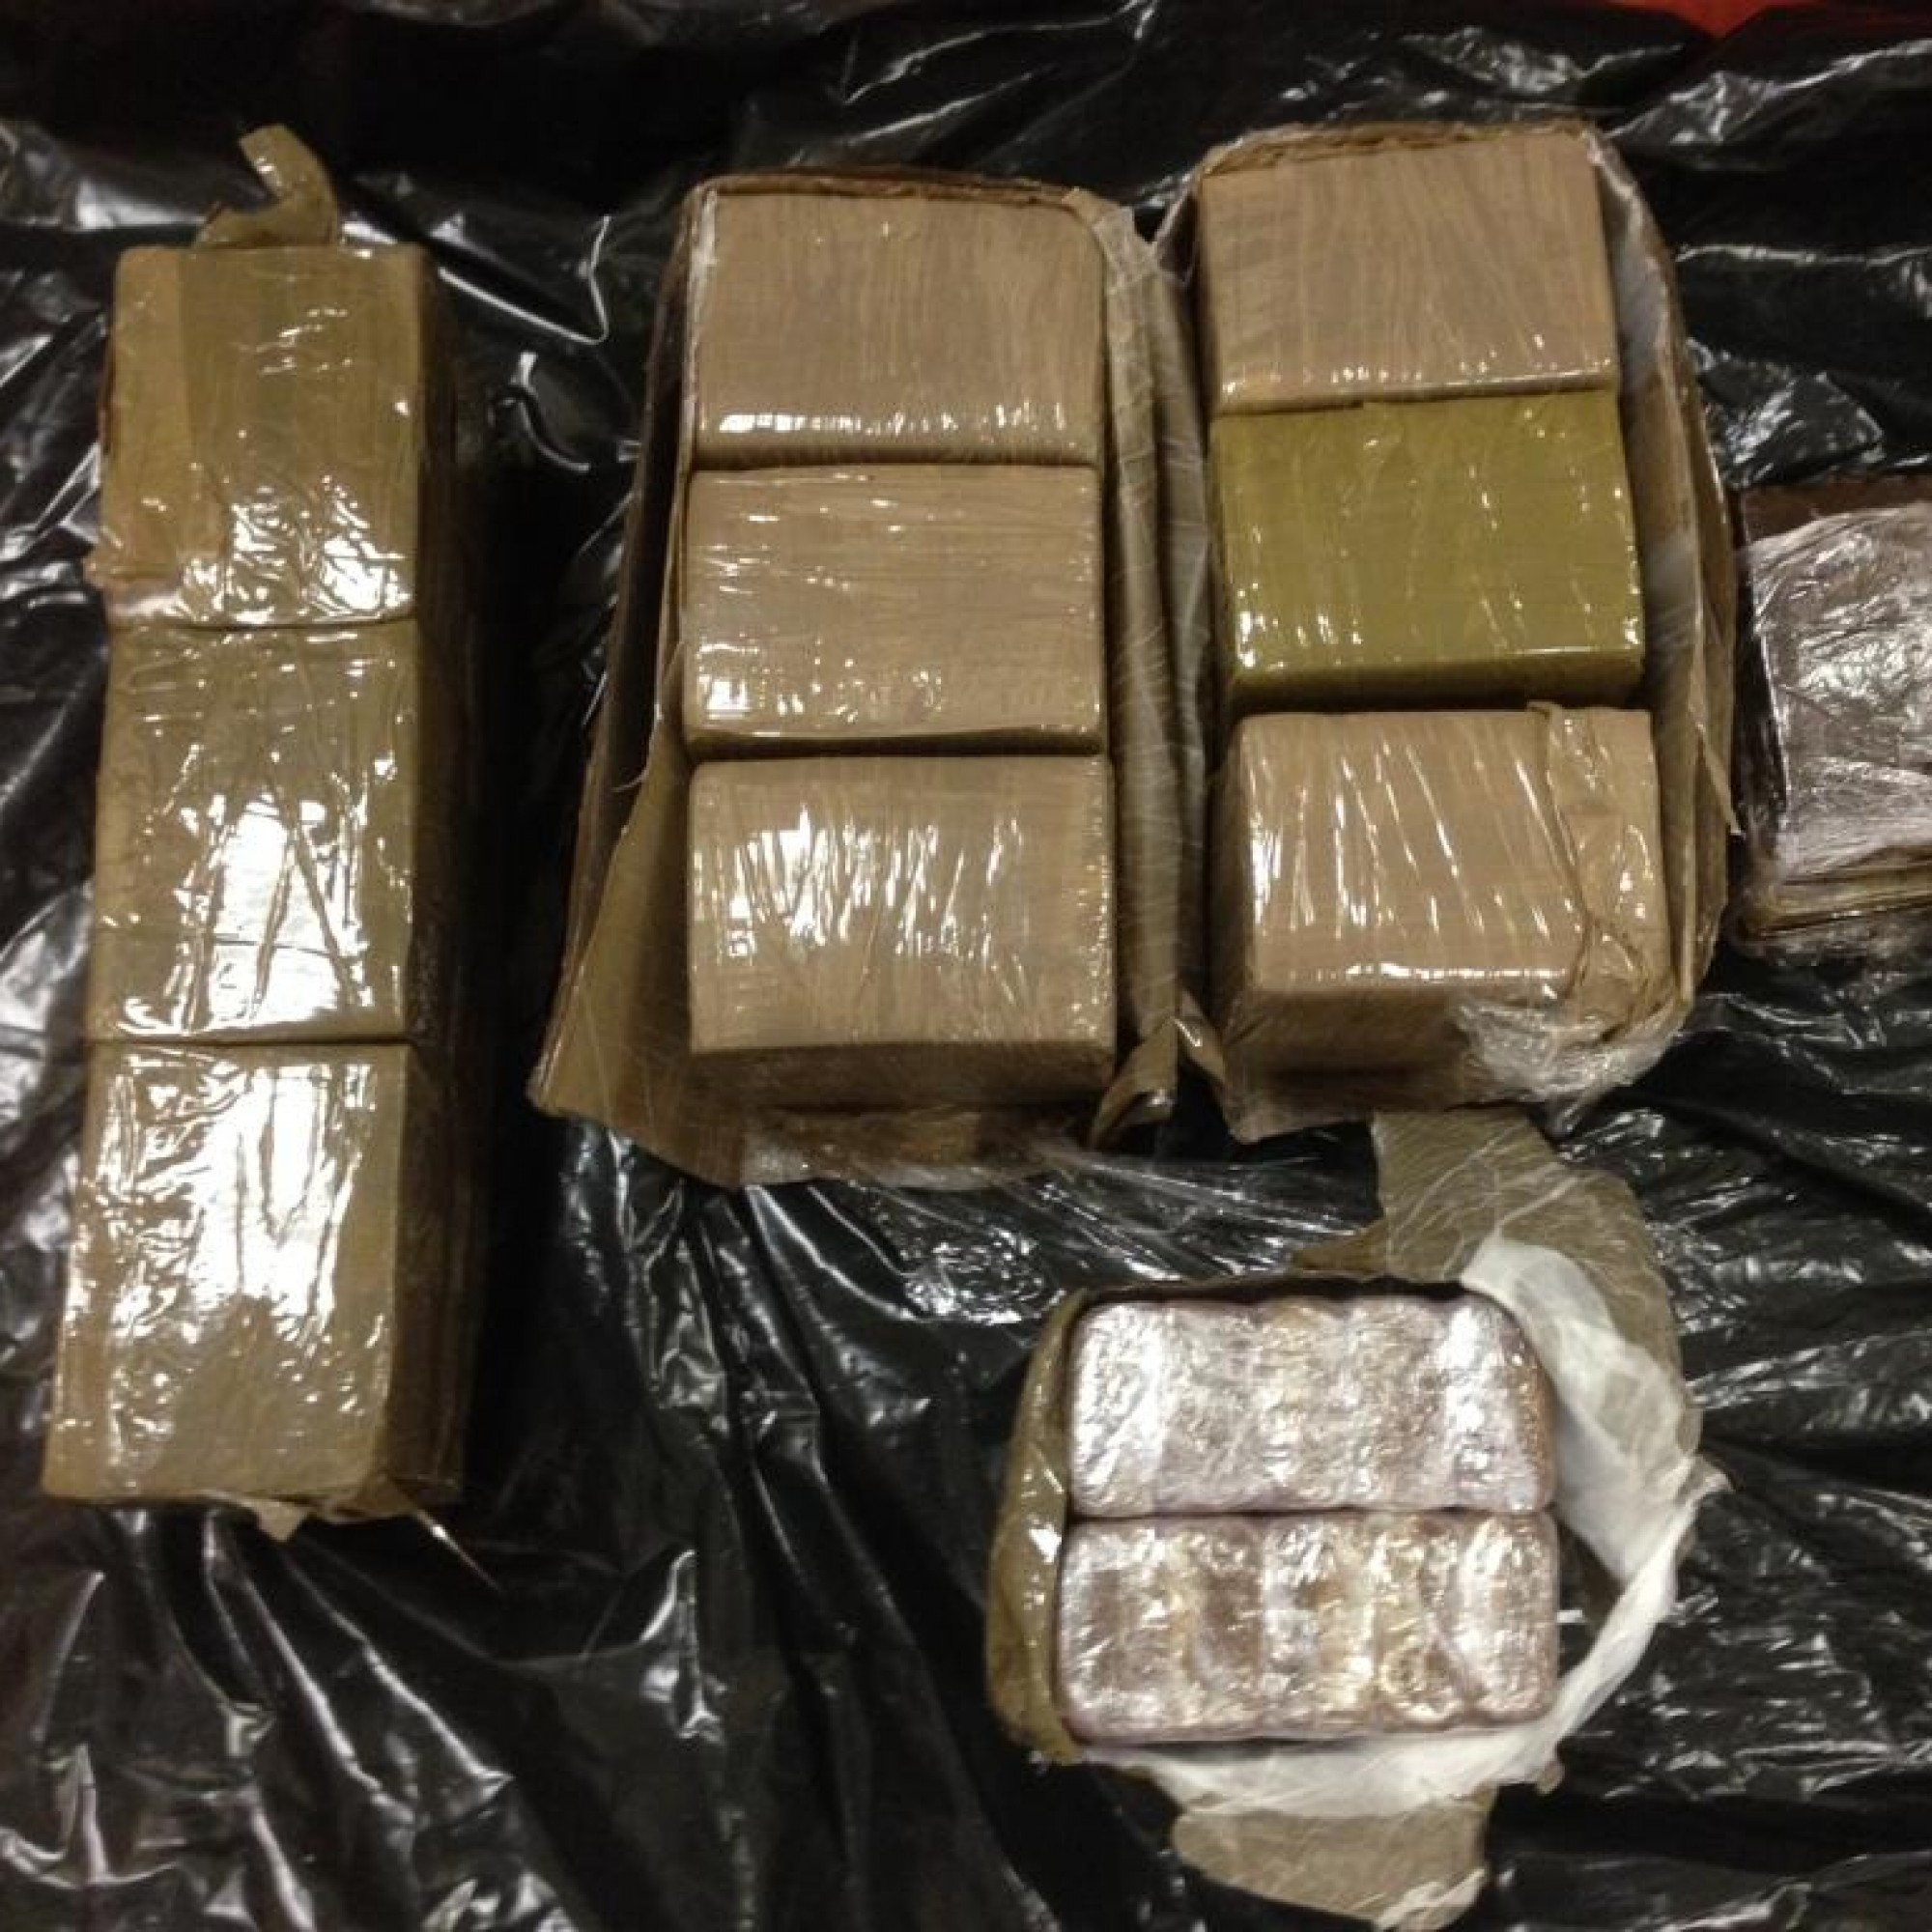 Cork gardaí seize �126k worth of cannabis resin